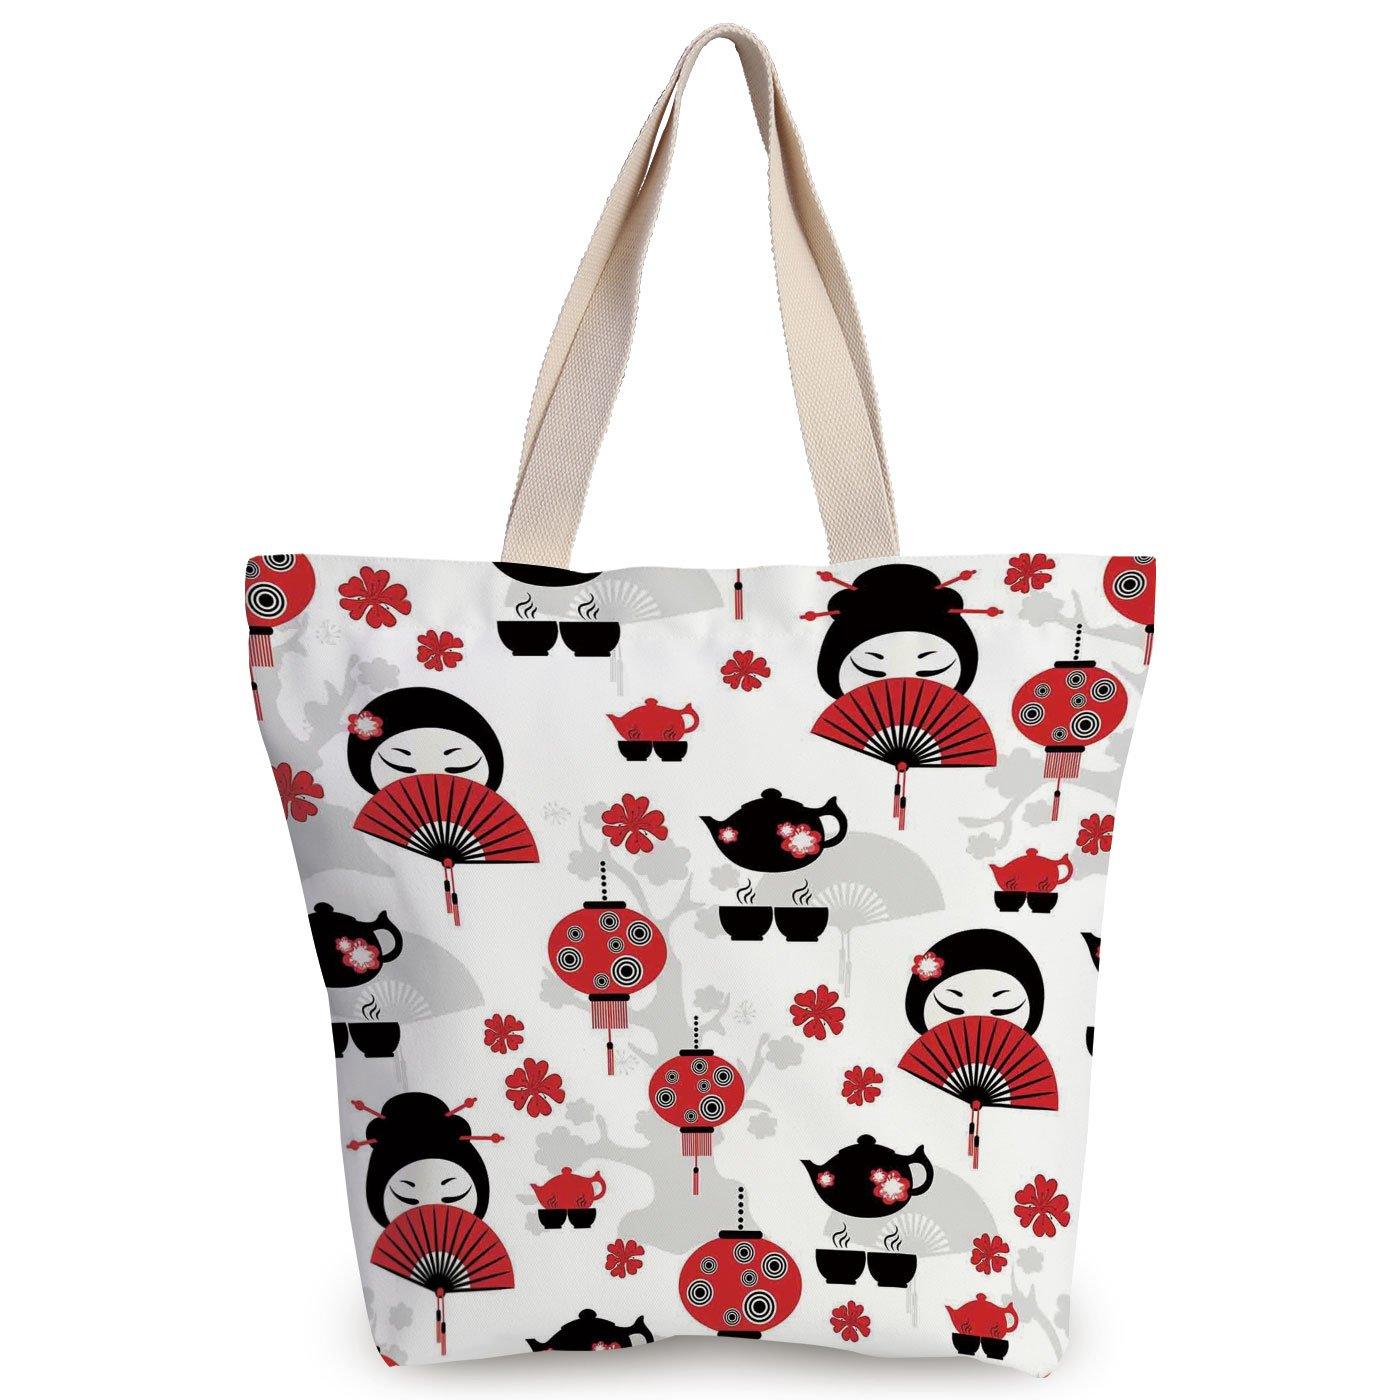 d940118863 Unique Durable Canvas Tote Bag,Lantern,Geisha Japanese Fan Ancient Chinese  Traditional Tea Pot Lanterns Floral Graphic Design Decorative,Black Red, Canvas ...